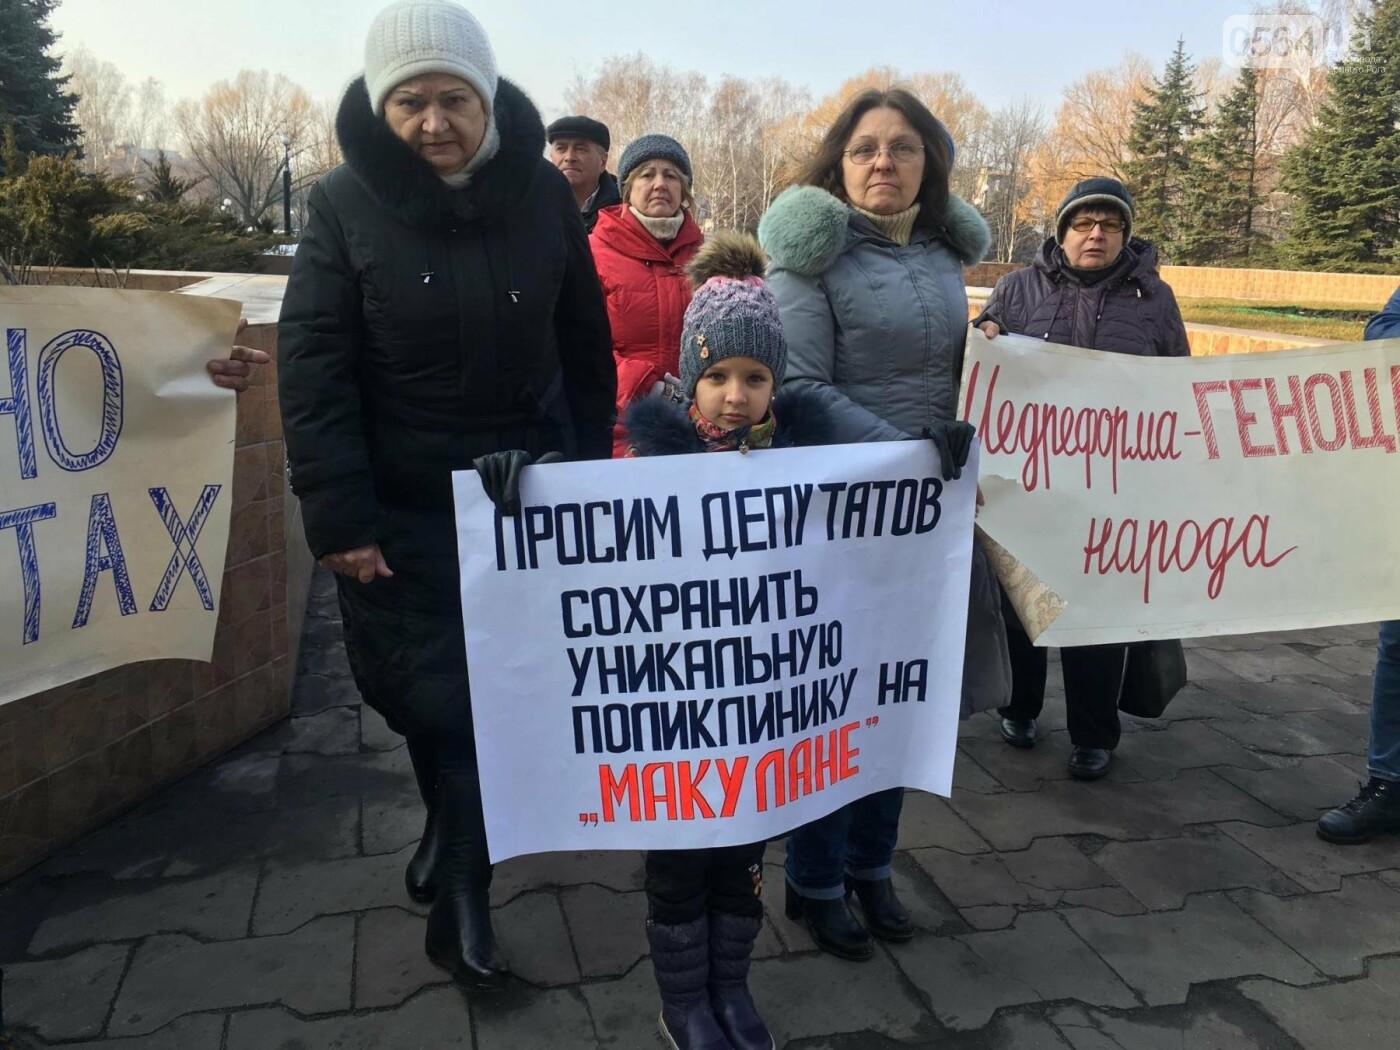 Под стенами Криворожского горисполкома проходит акция протеста медиков (ФОТО), фото-8